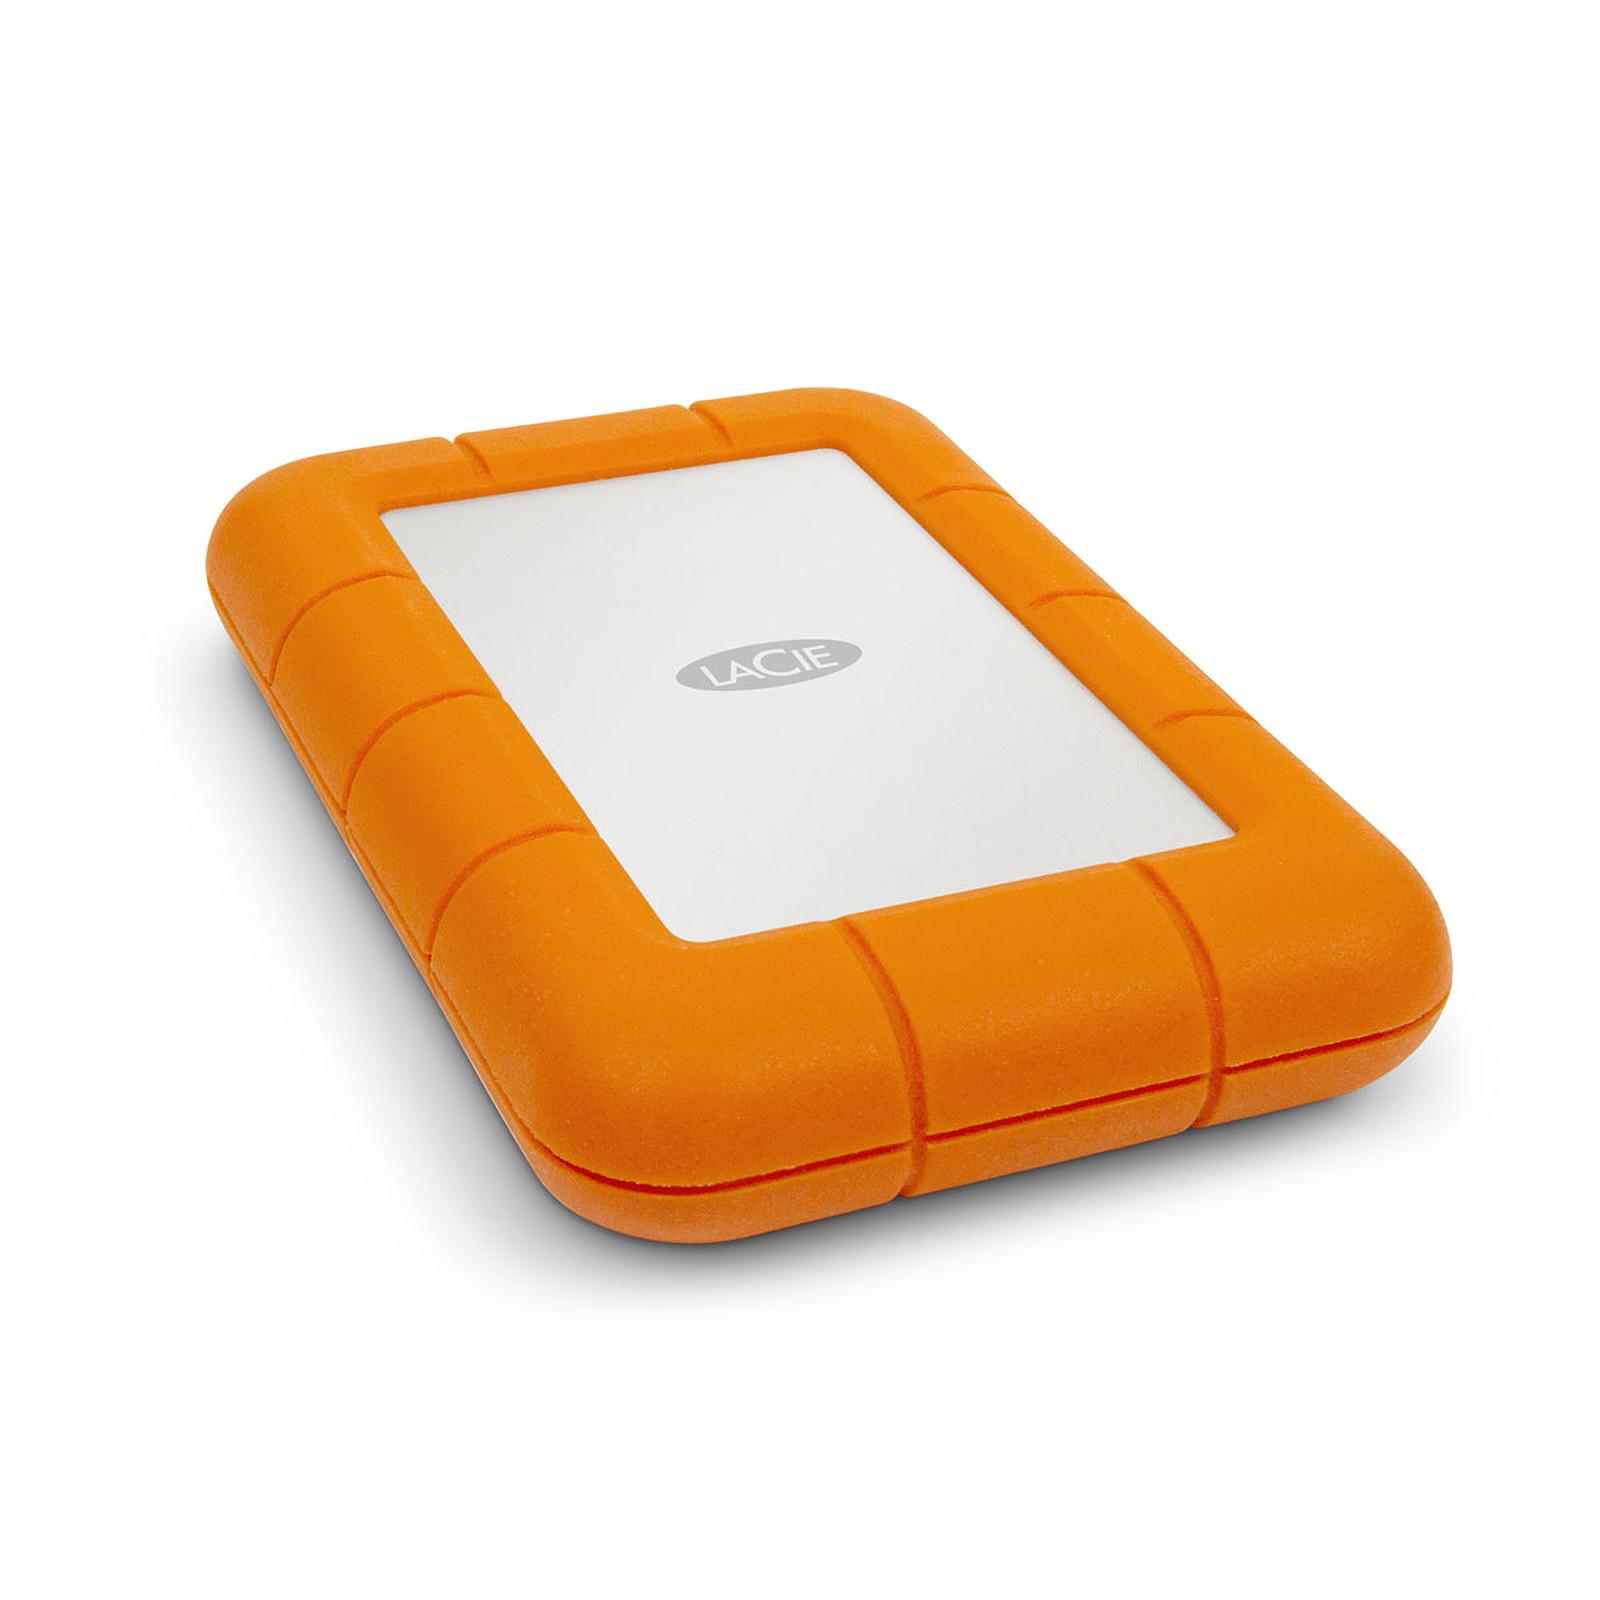 LaCie Rugged USB 3.0 Thunderbolt 2 To